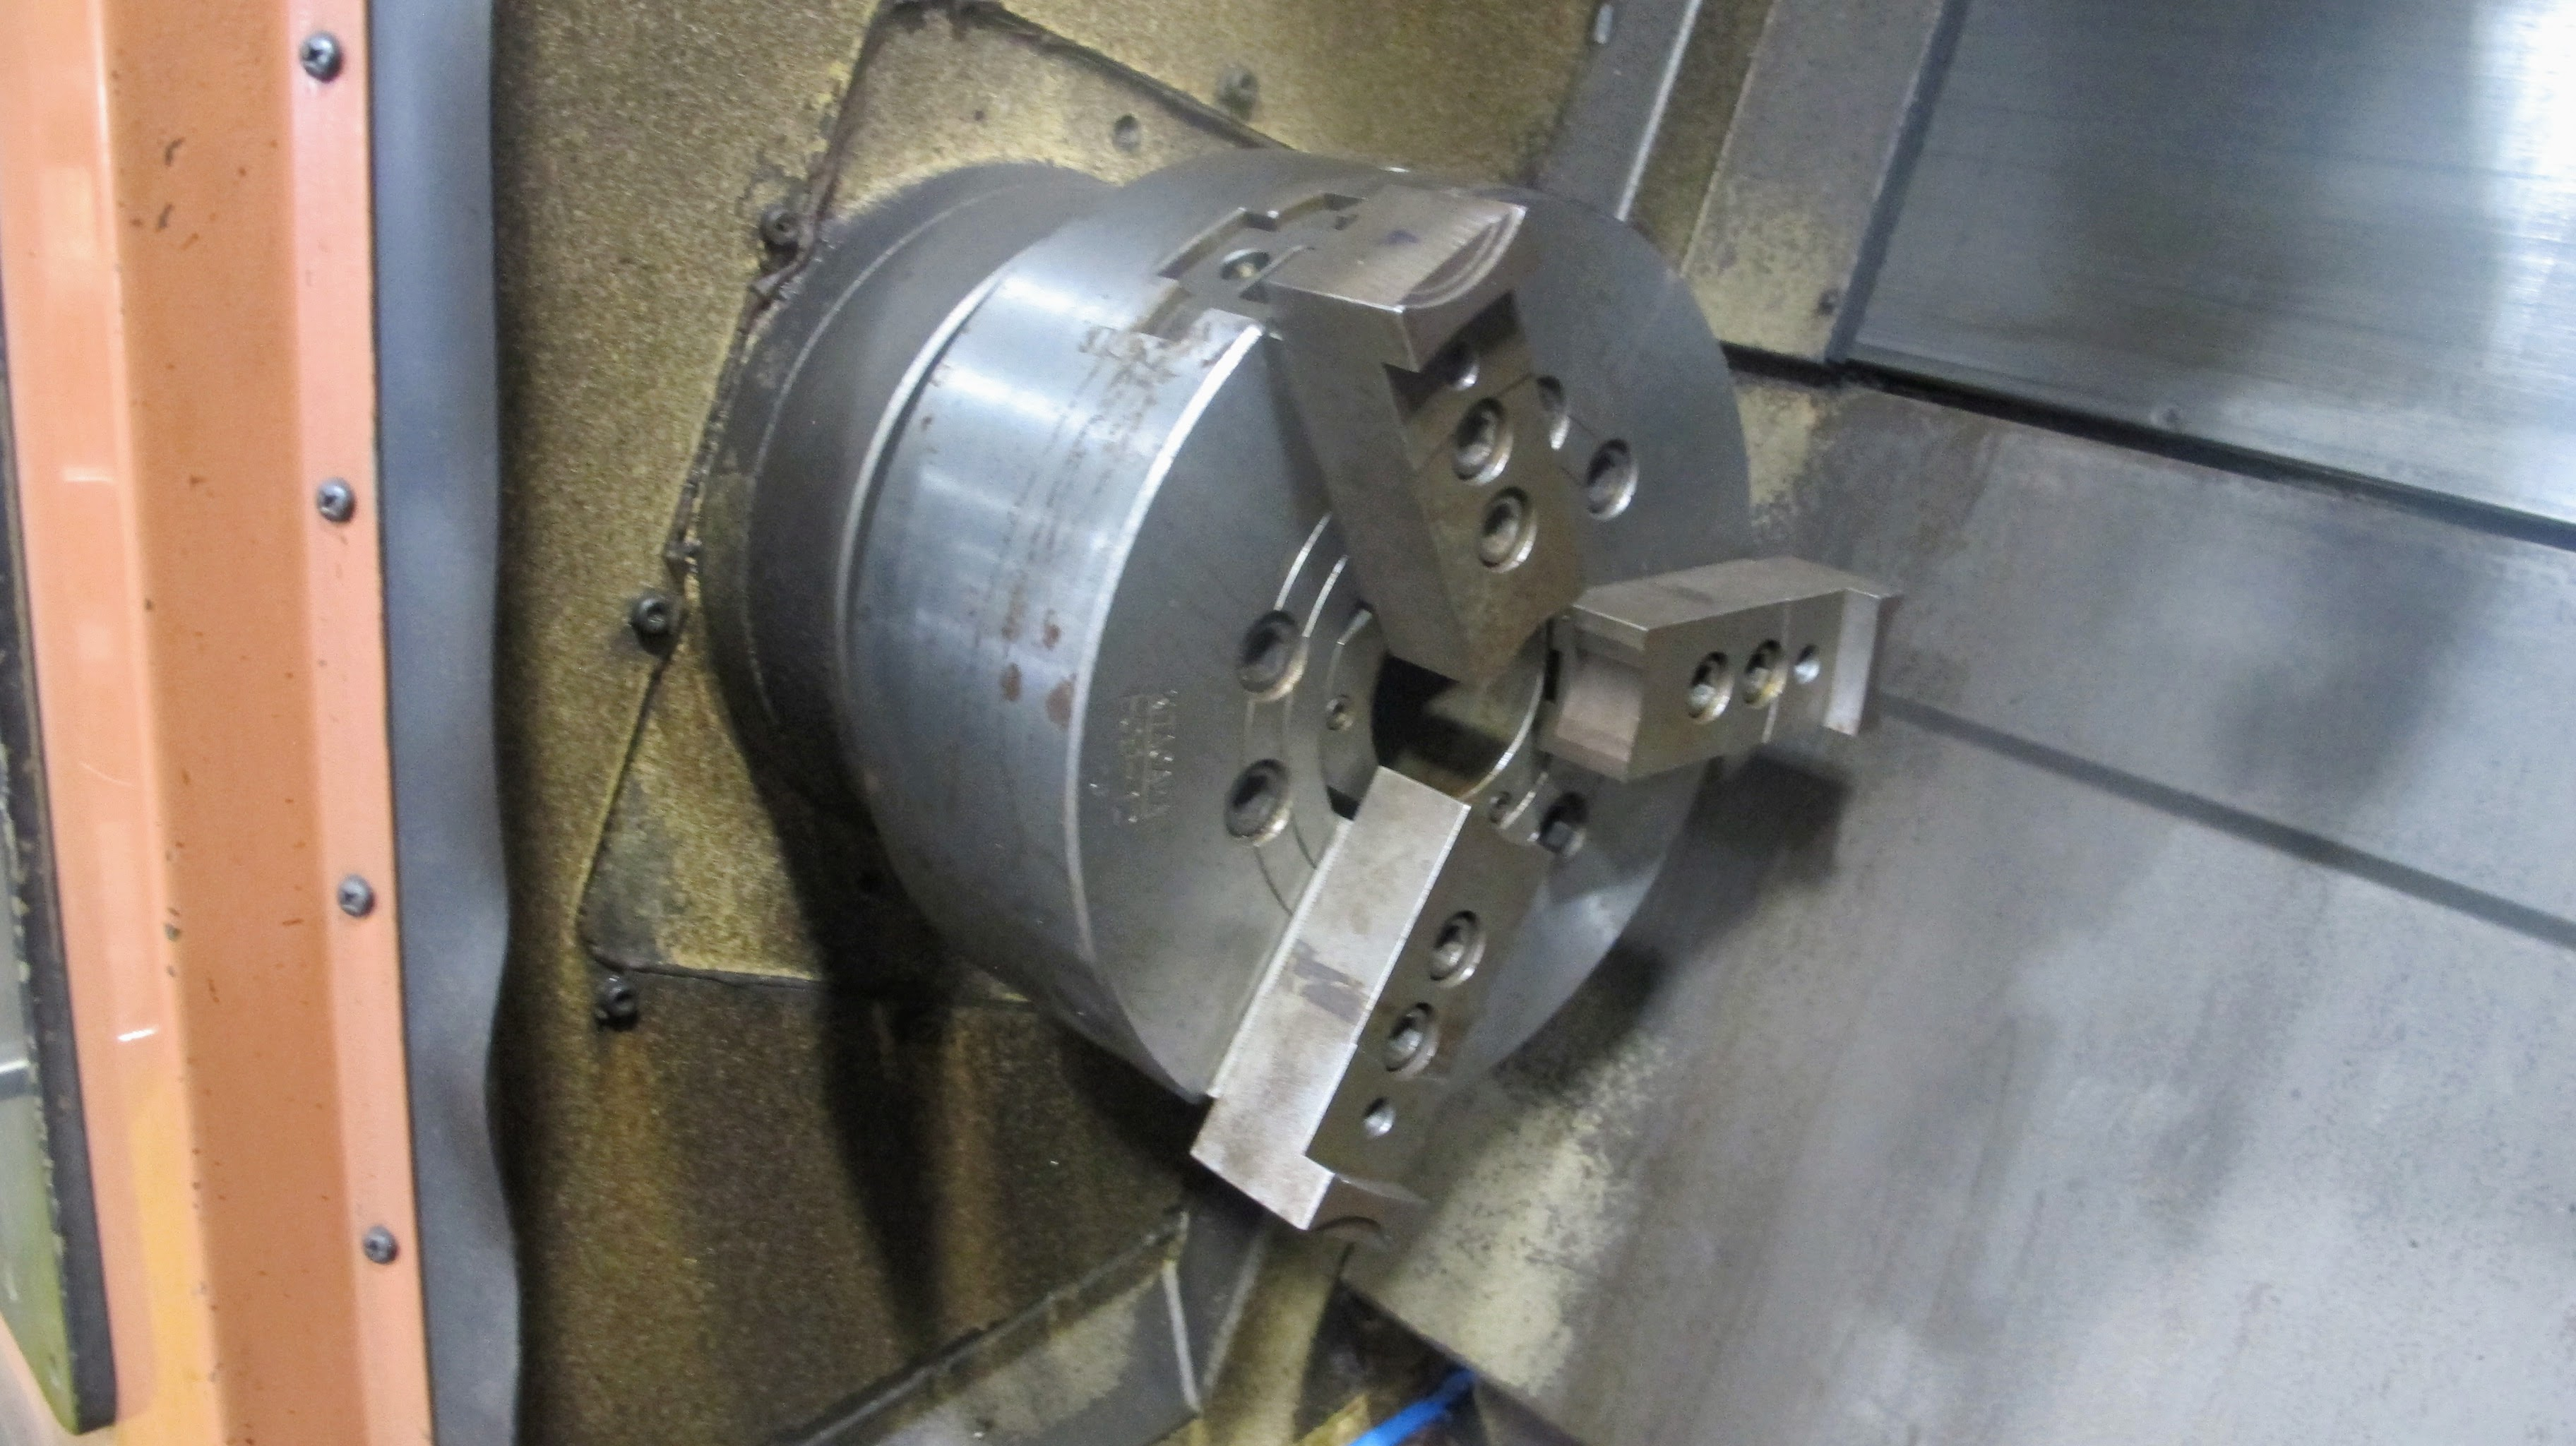 "OKUMA ACT-4 CNC LATHE W/12"" 3 JAW CHUCK, FANUC CONTROL, TAIL STOCK, ATC-12 W/10 TOOL HOLDERS, - Image 4 of 17"